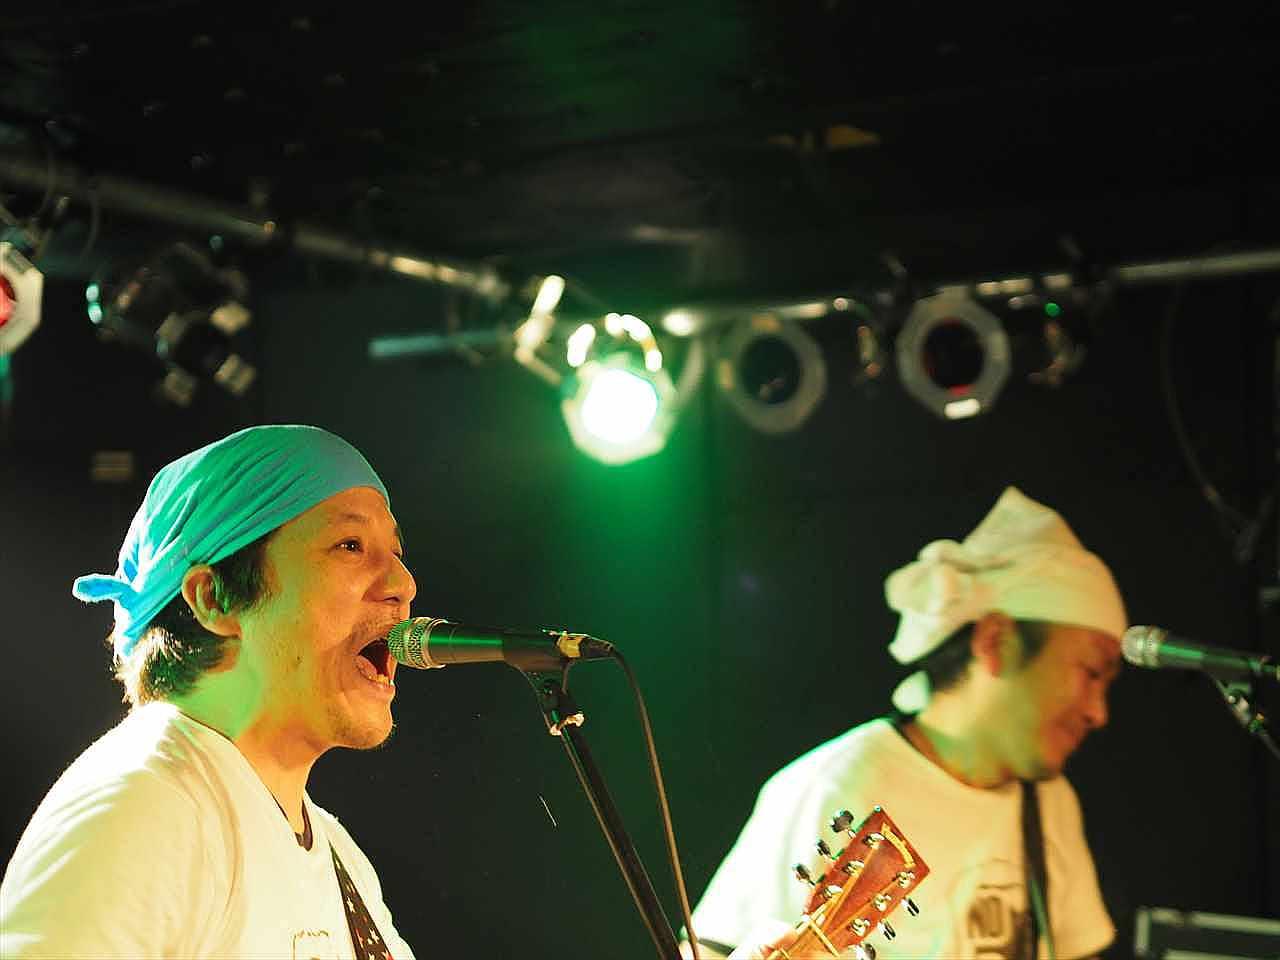 TUCK−NEYS ツクネーズ CROWBAR 徳島ロックストリート vol.16